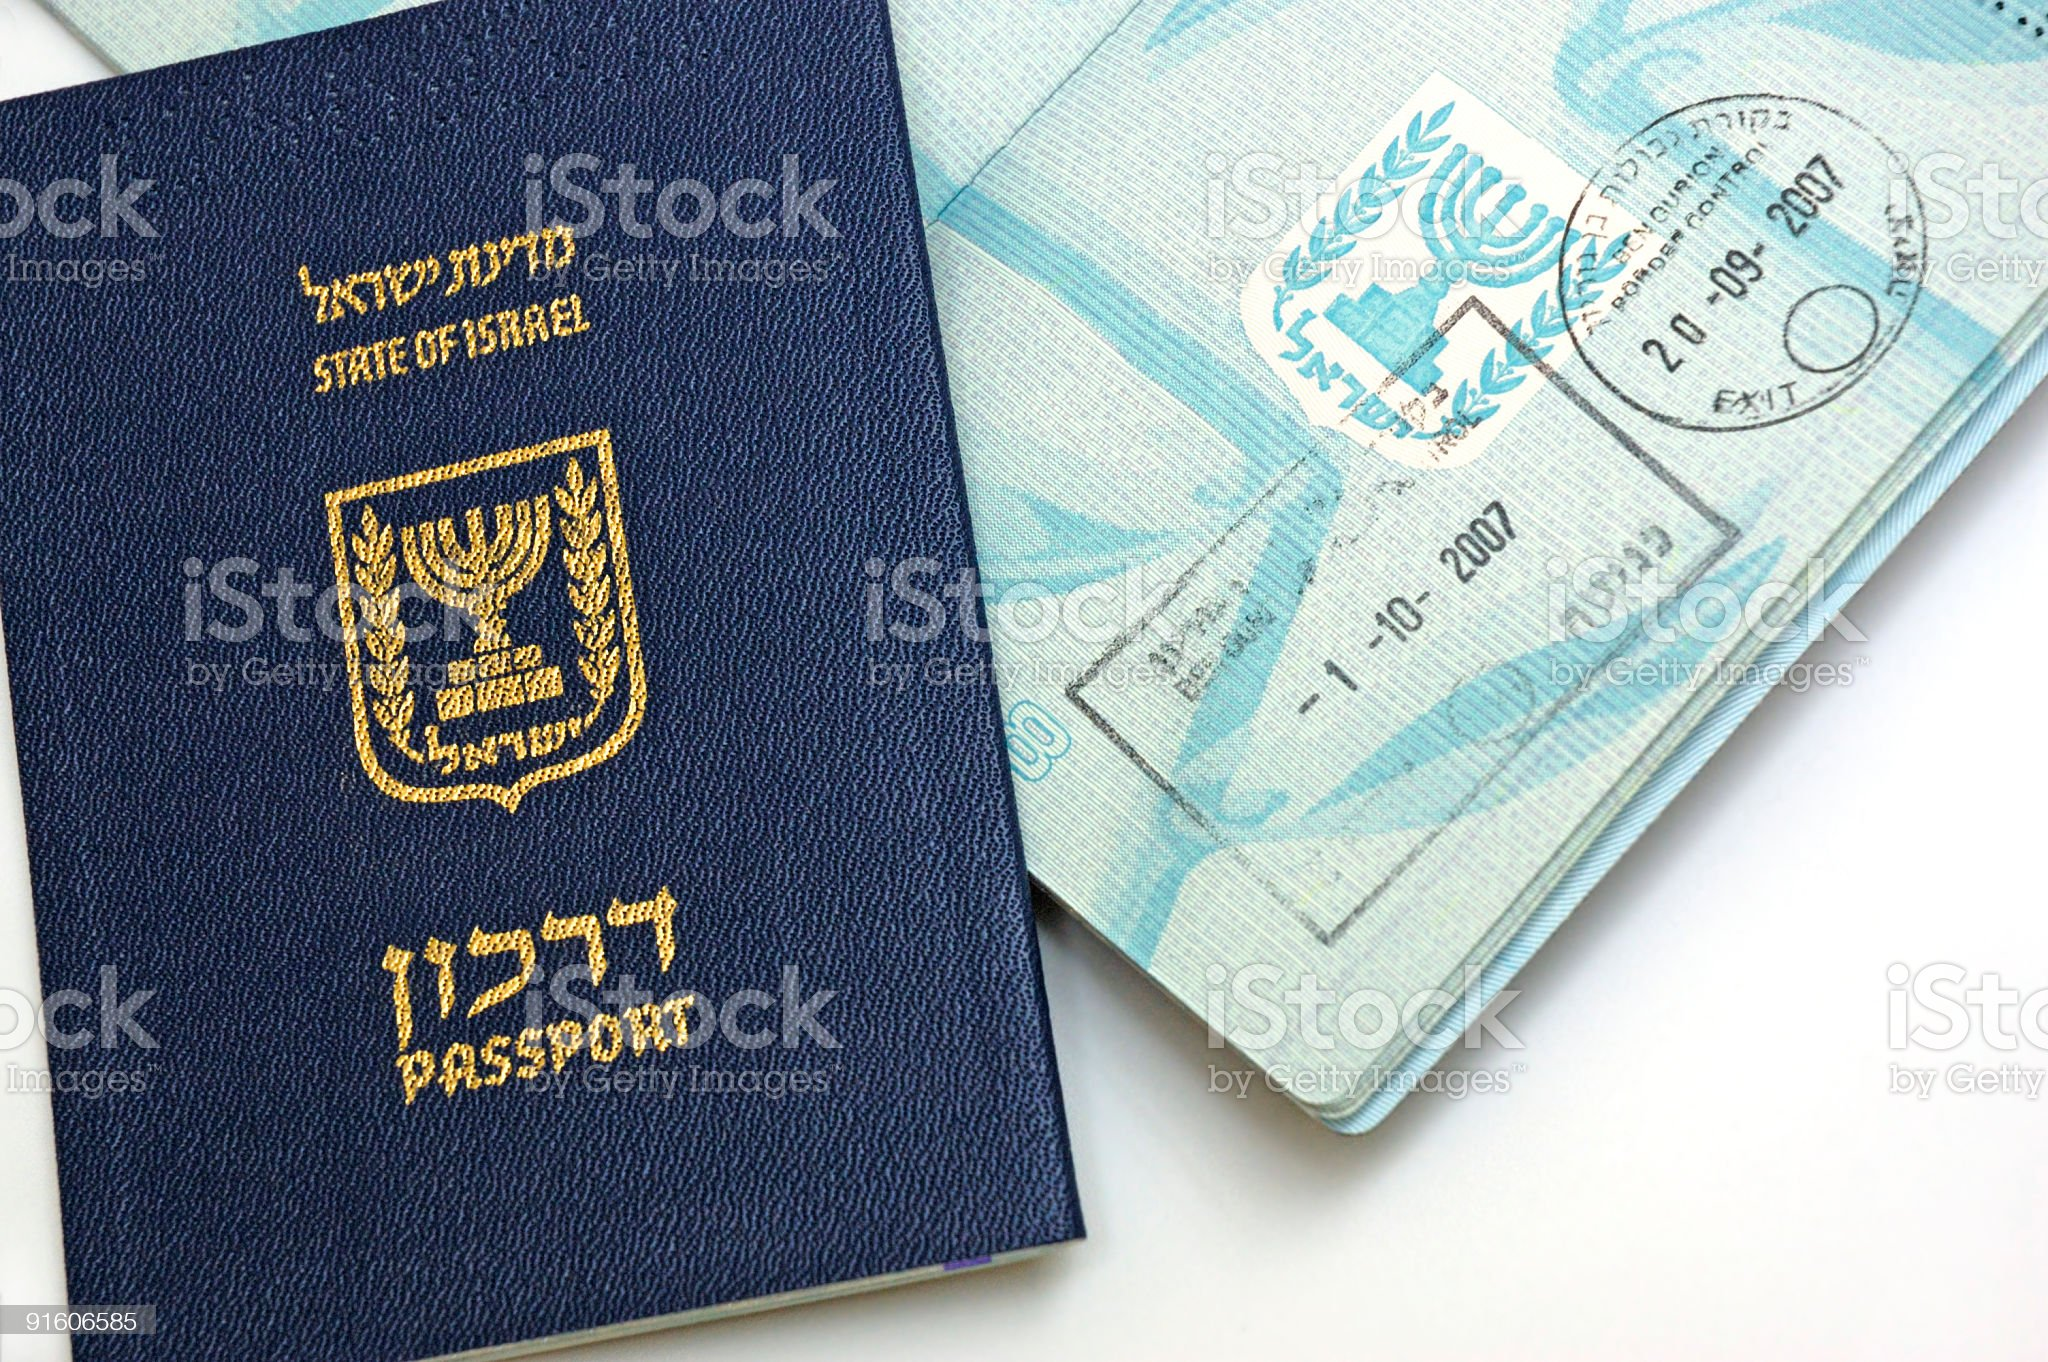 Passport of  Israel citizen royalty-free stock photo